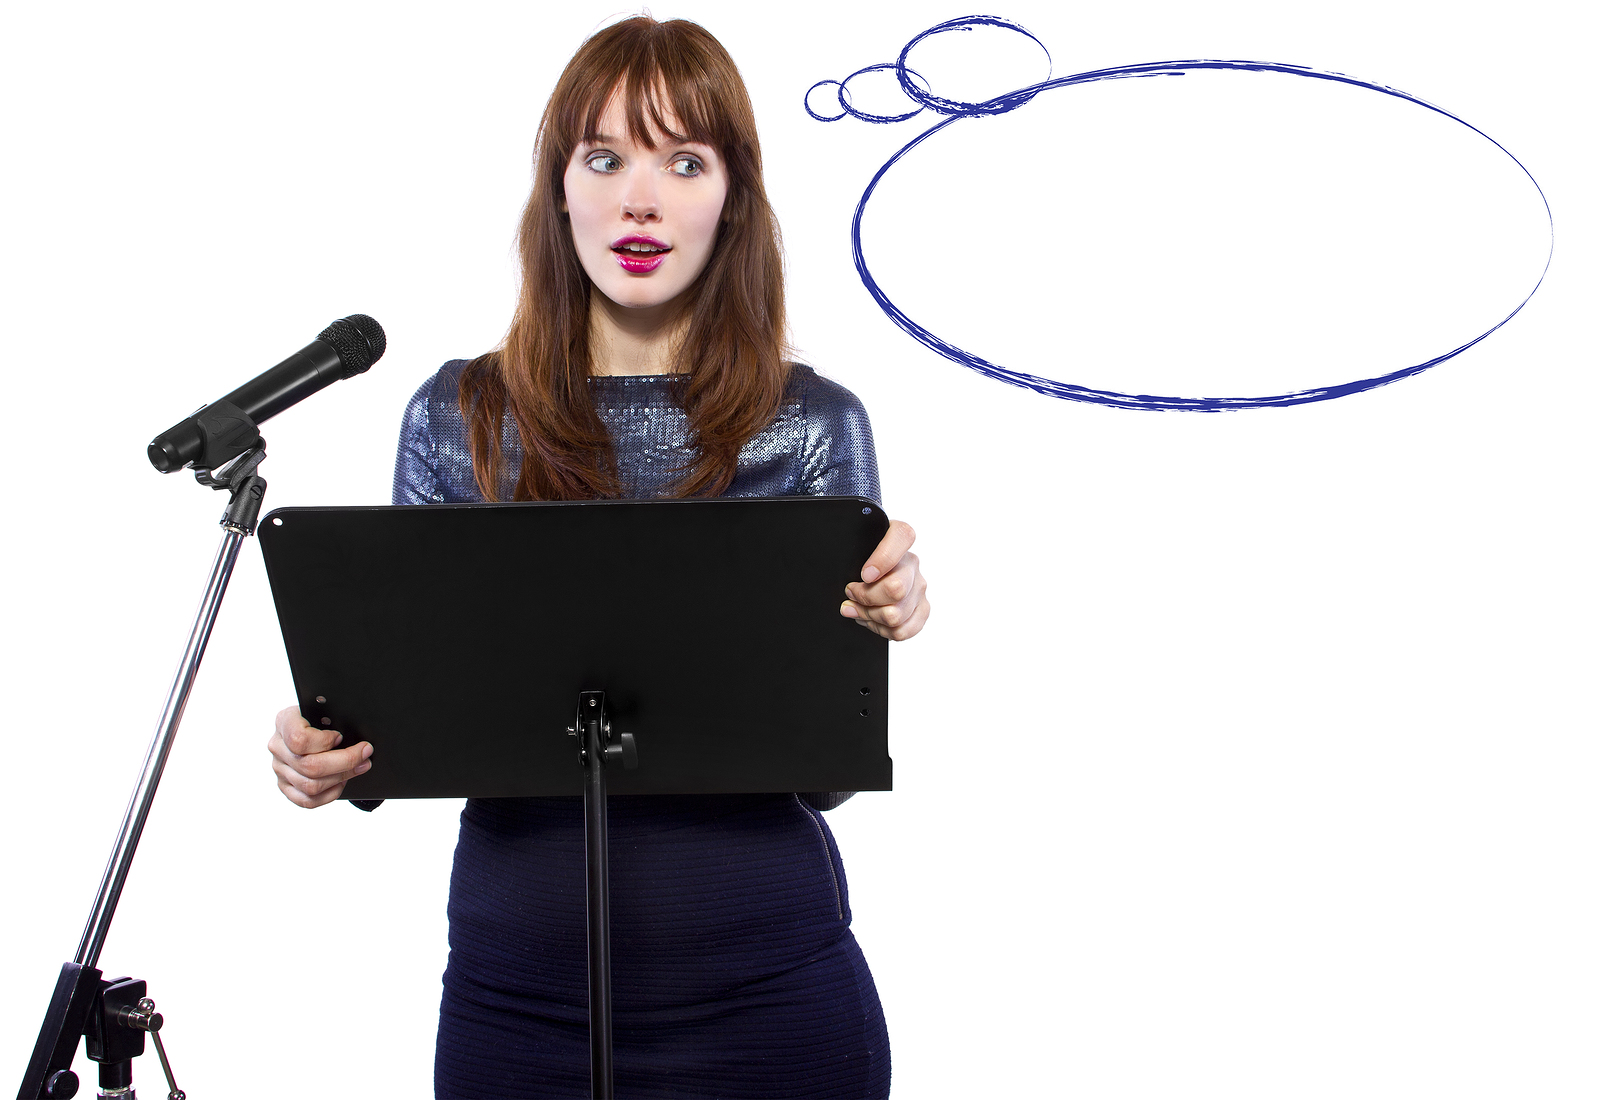 effective public speaker